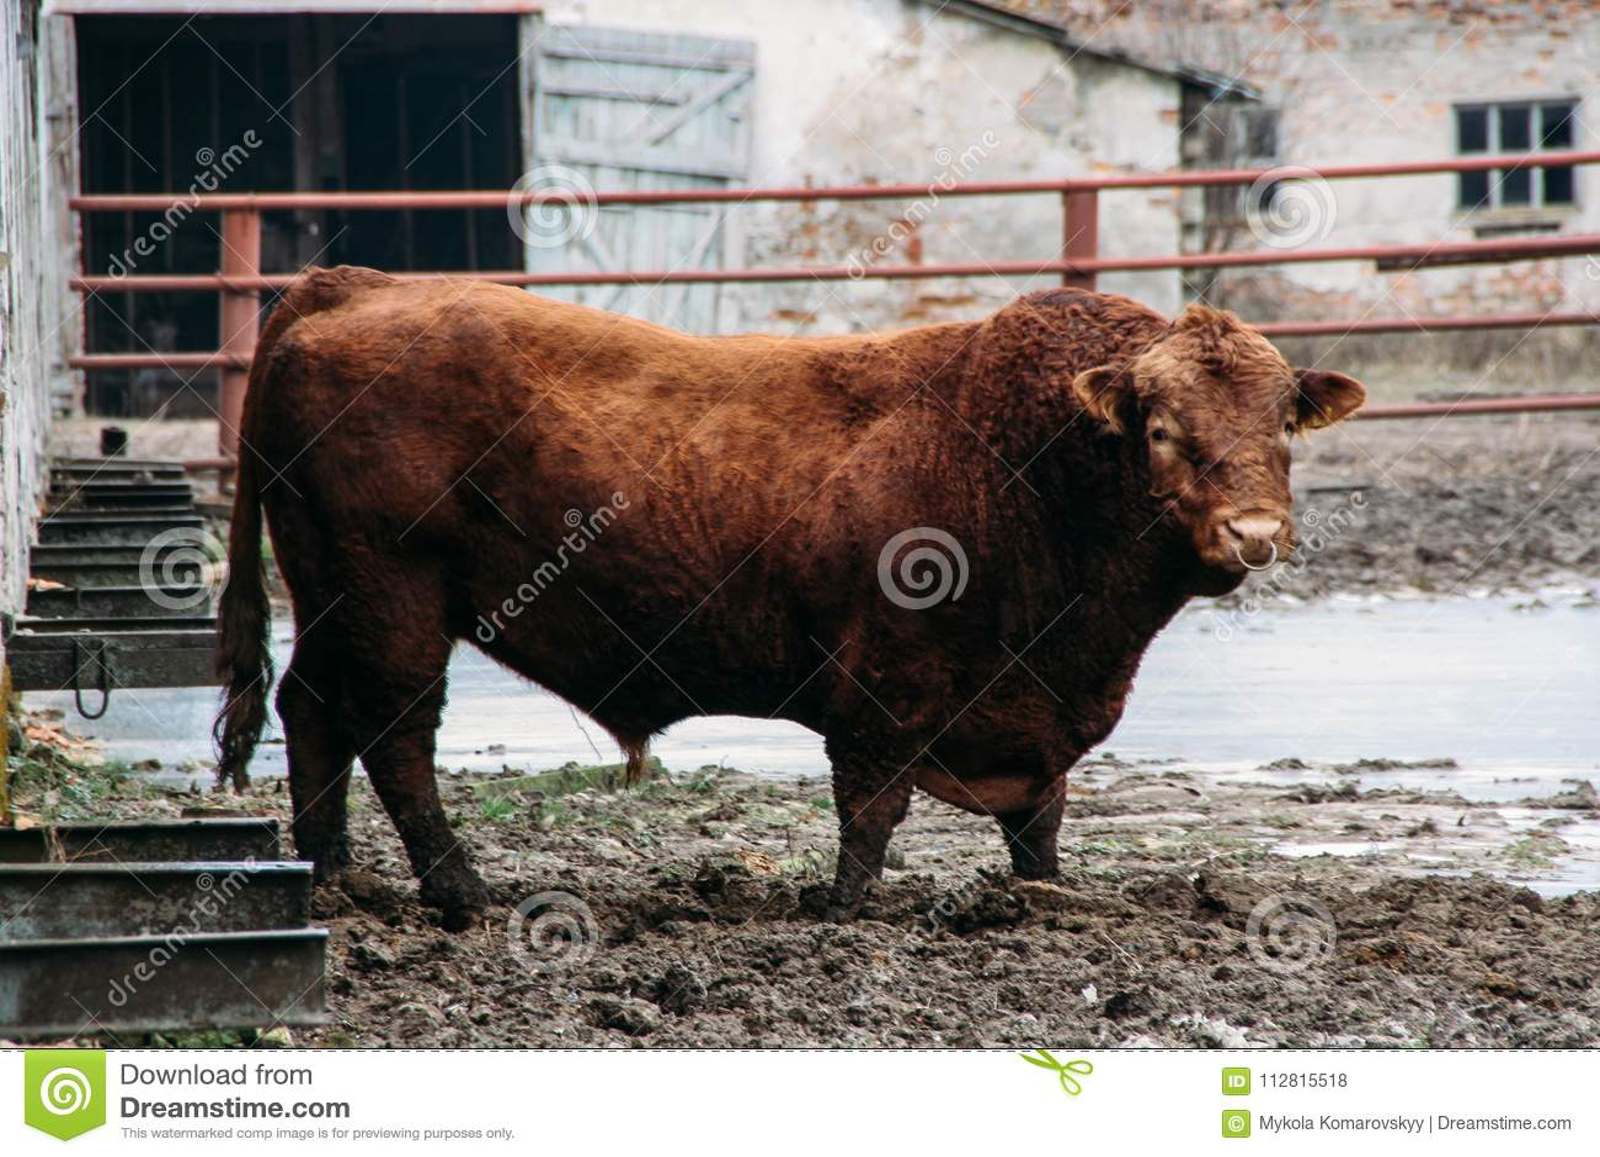 Dangerous Looking Bull Stock Photo Image Of Domestic 112815518